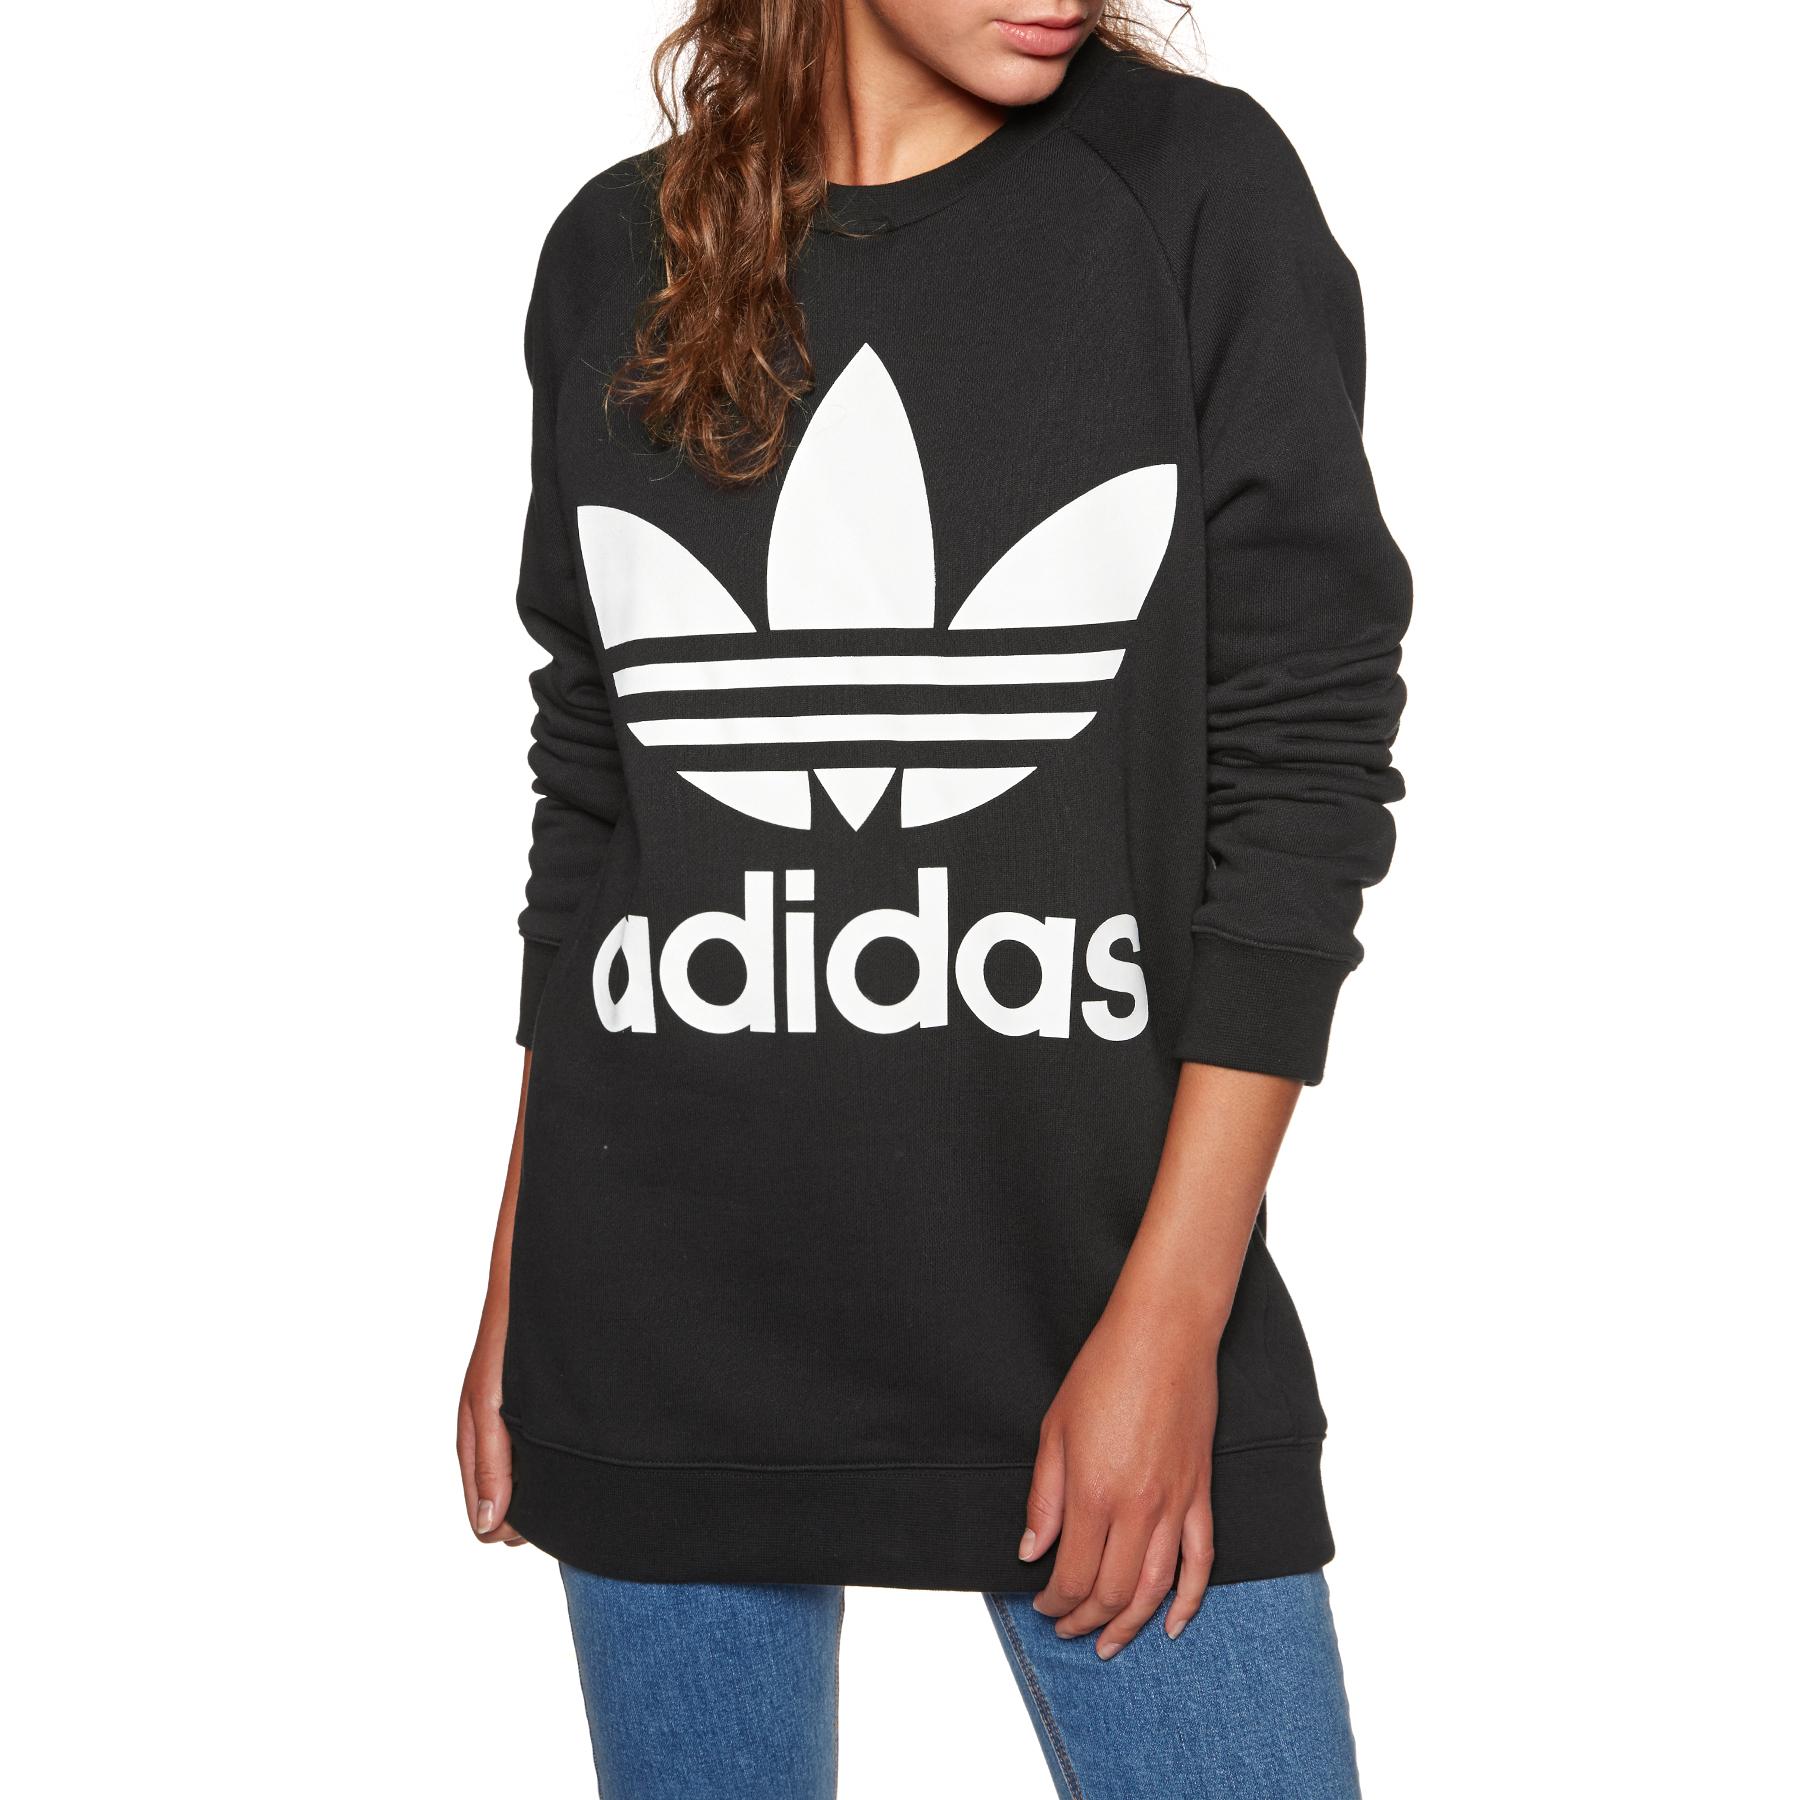 Sweat Femme Adidas Originals Oversized   Livraison gratuite